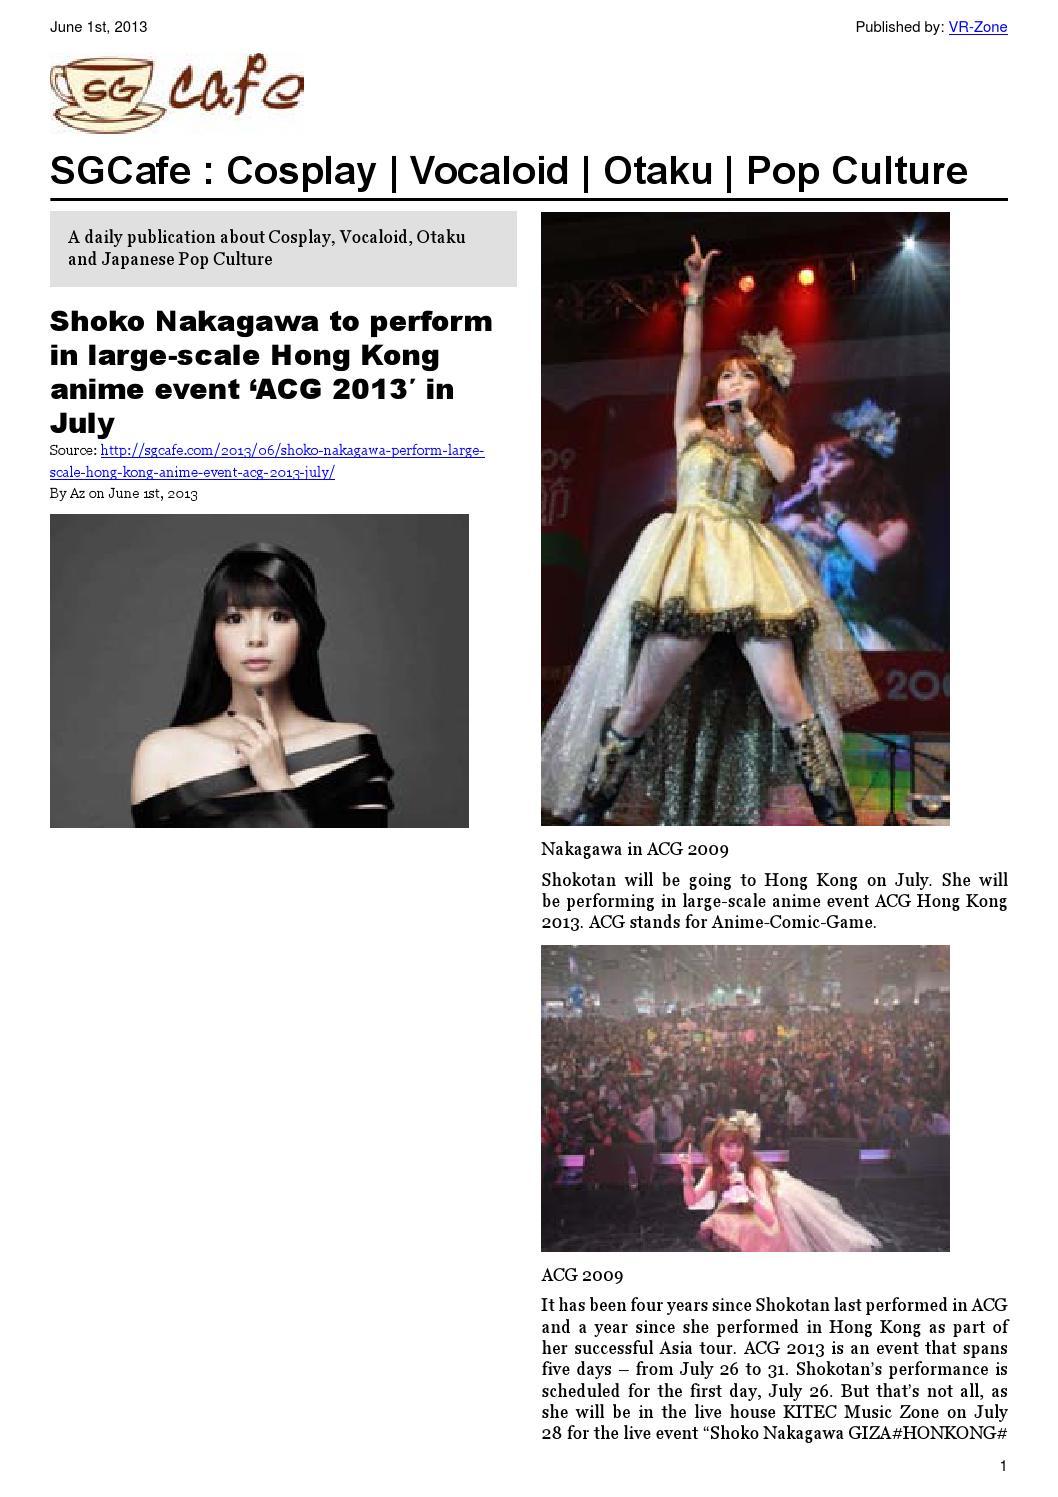 imouto.tv kondou asami sexy SGcafe Anime News For Otaku Jun 2013 Issue by VR Media Pte. Ltd. - issuu